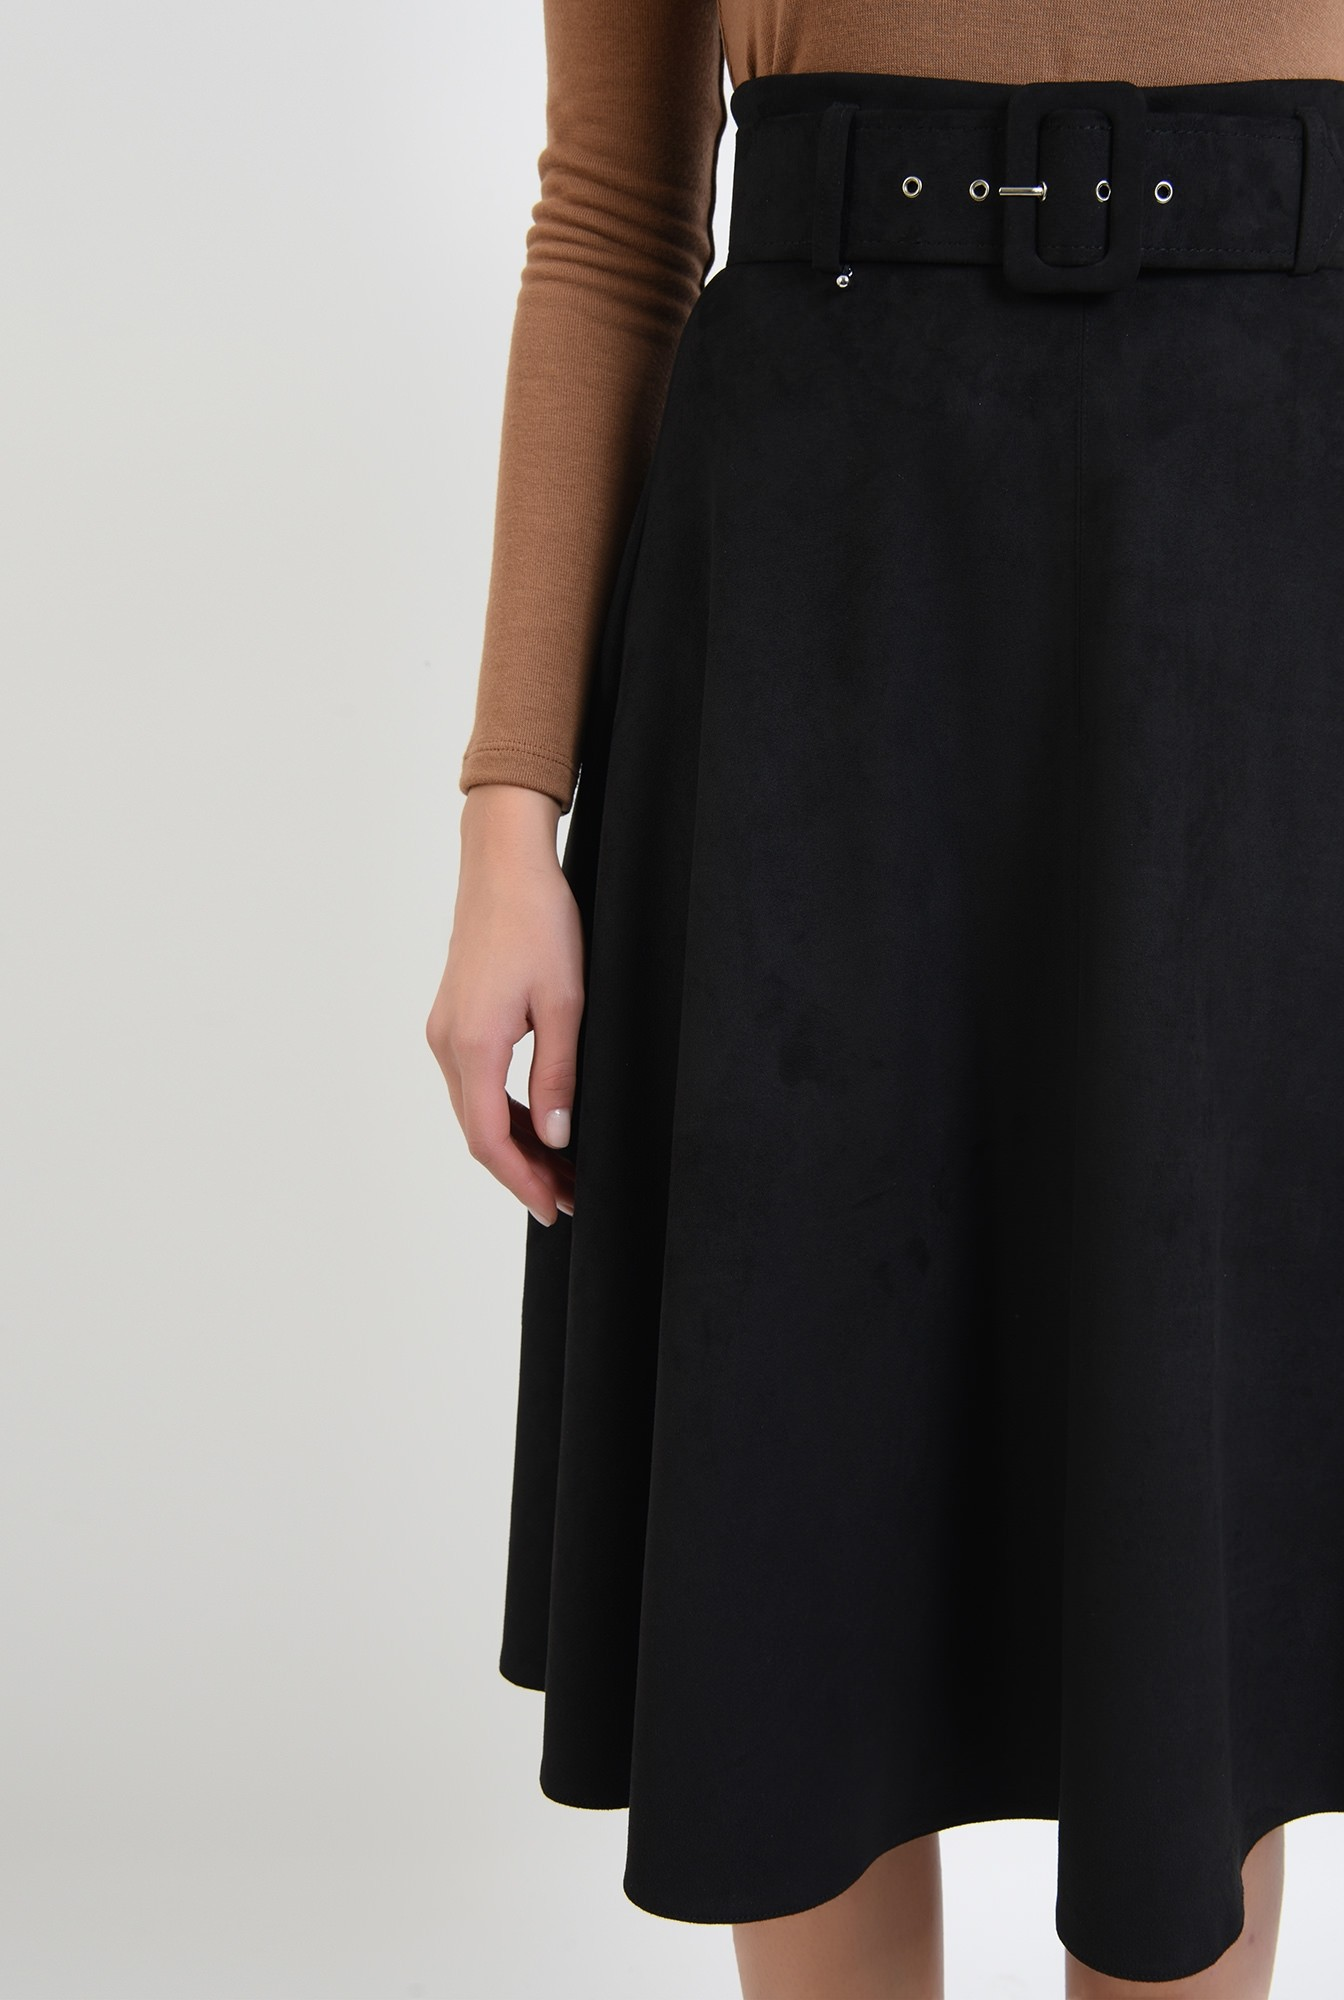 2 - fusta evazata, neagra, midi, cu centura